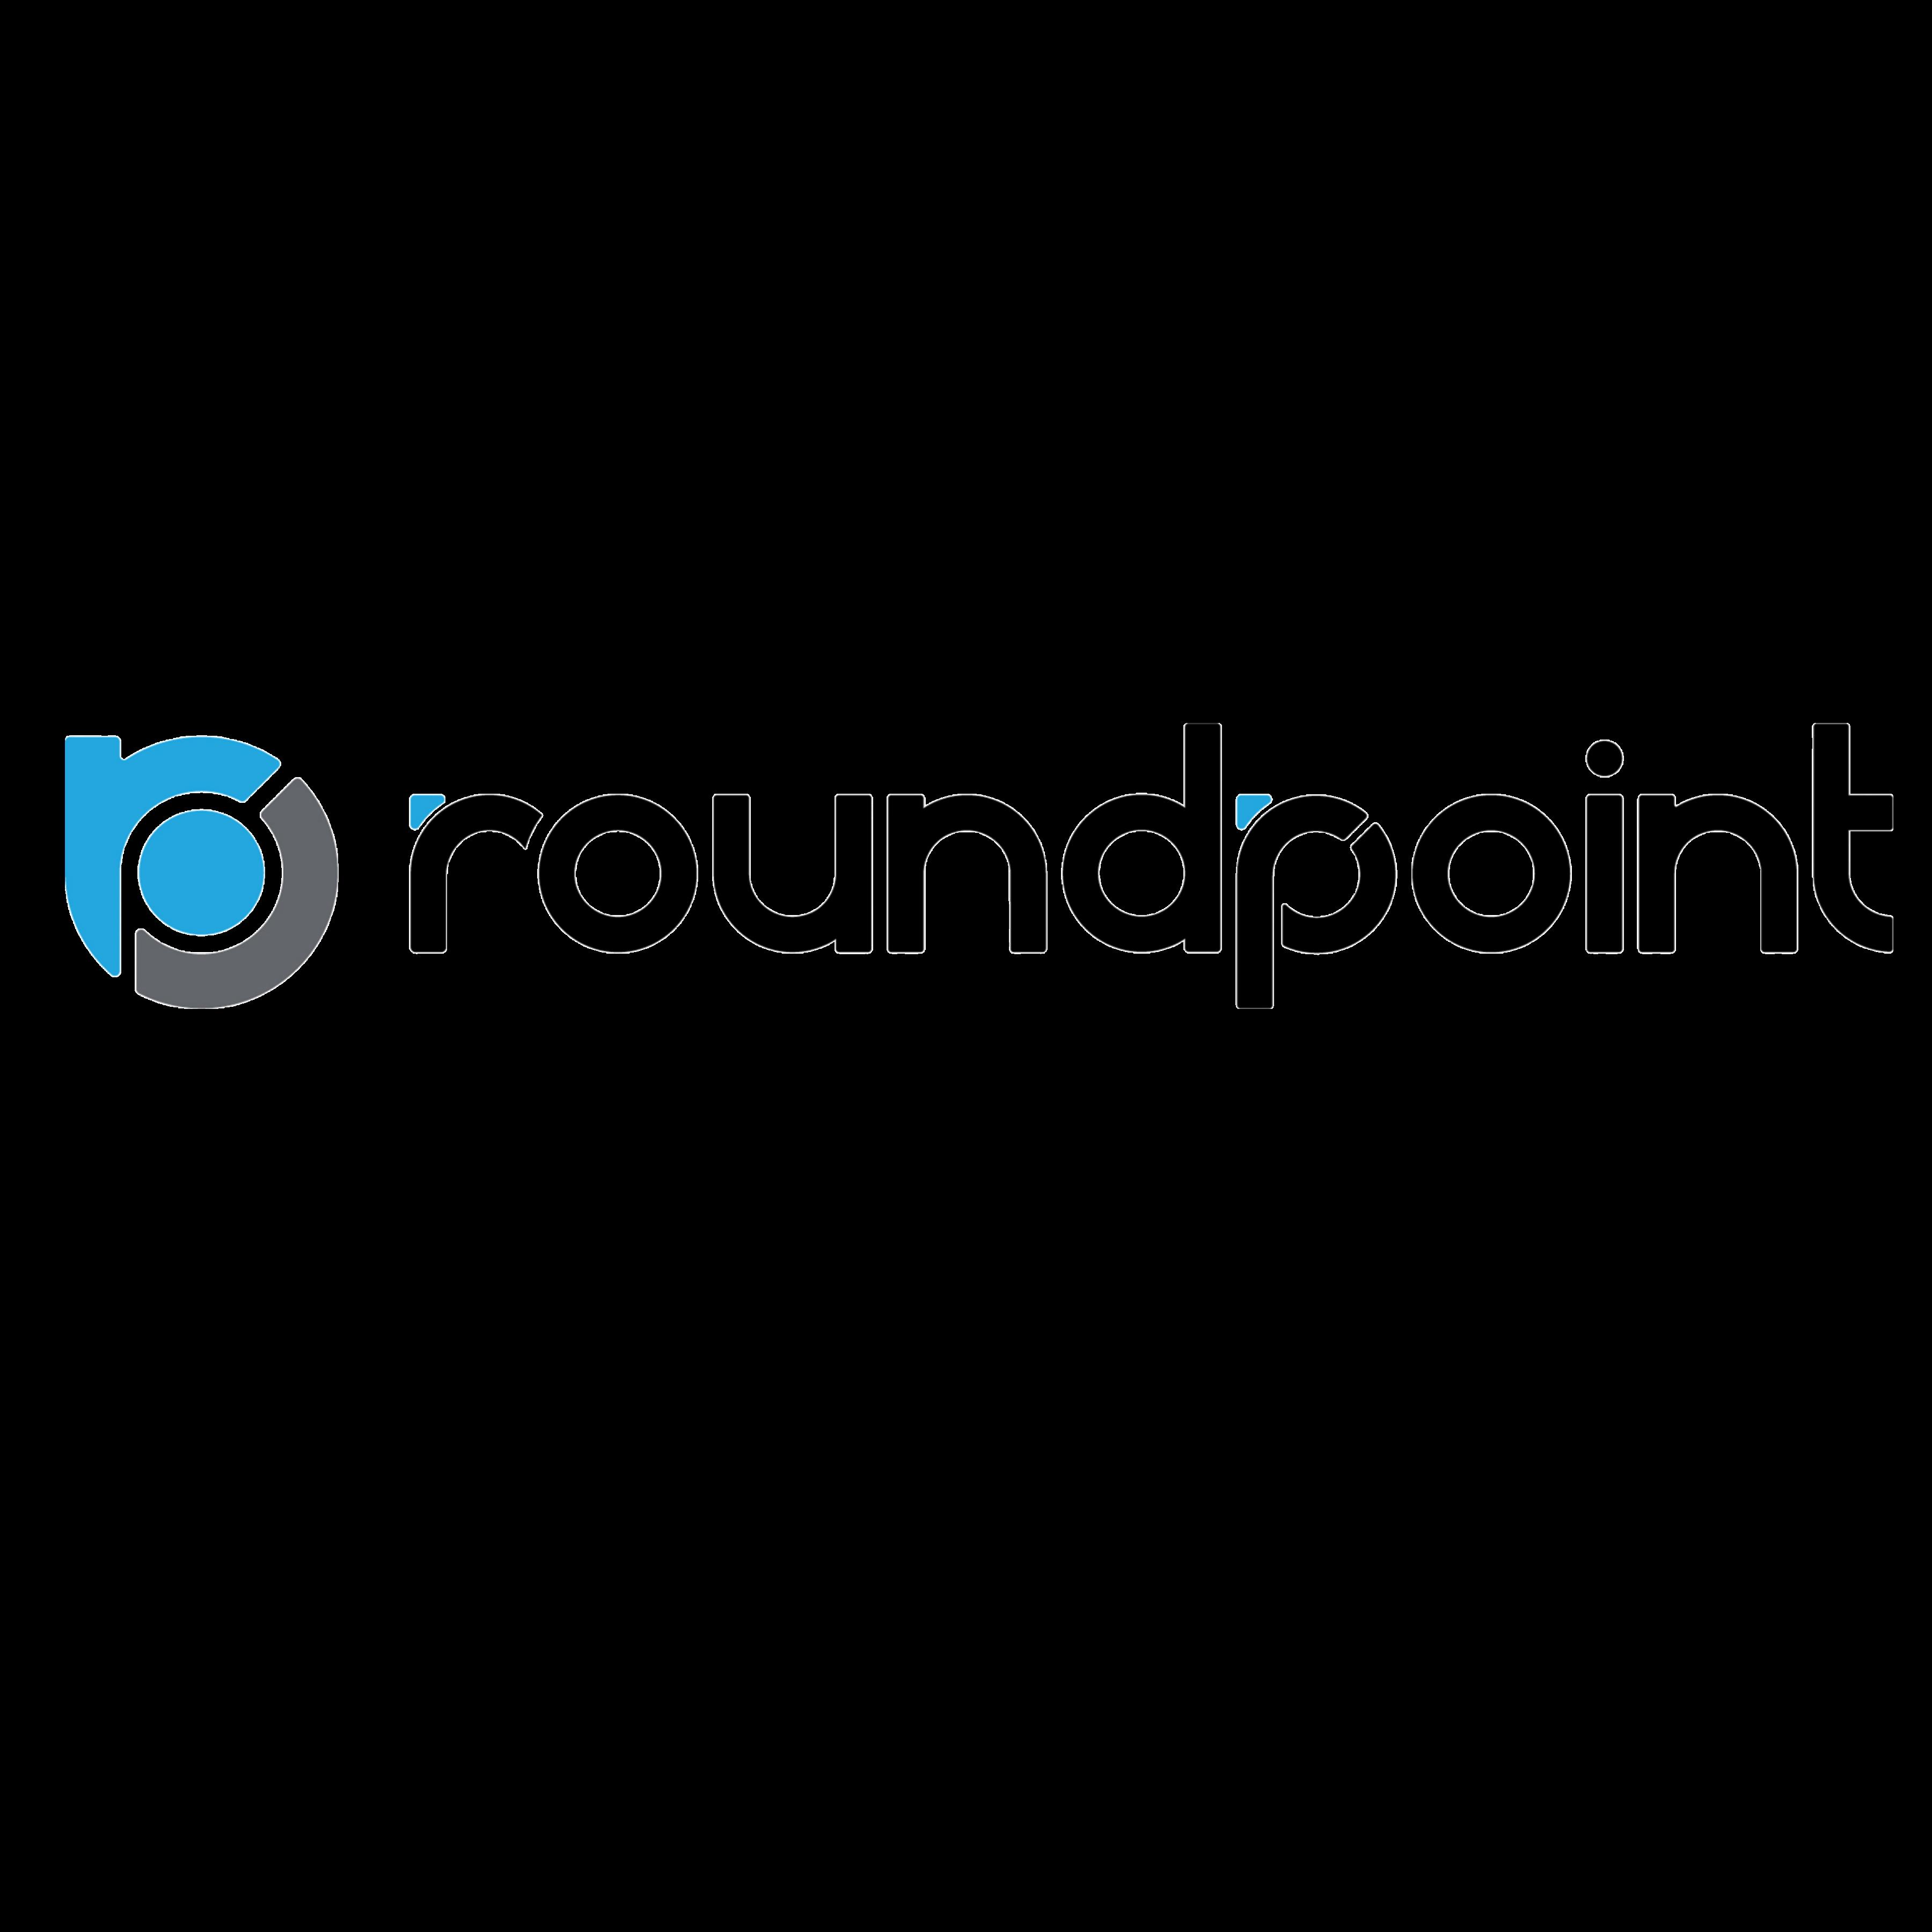 roundpoint logo 2 (1)